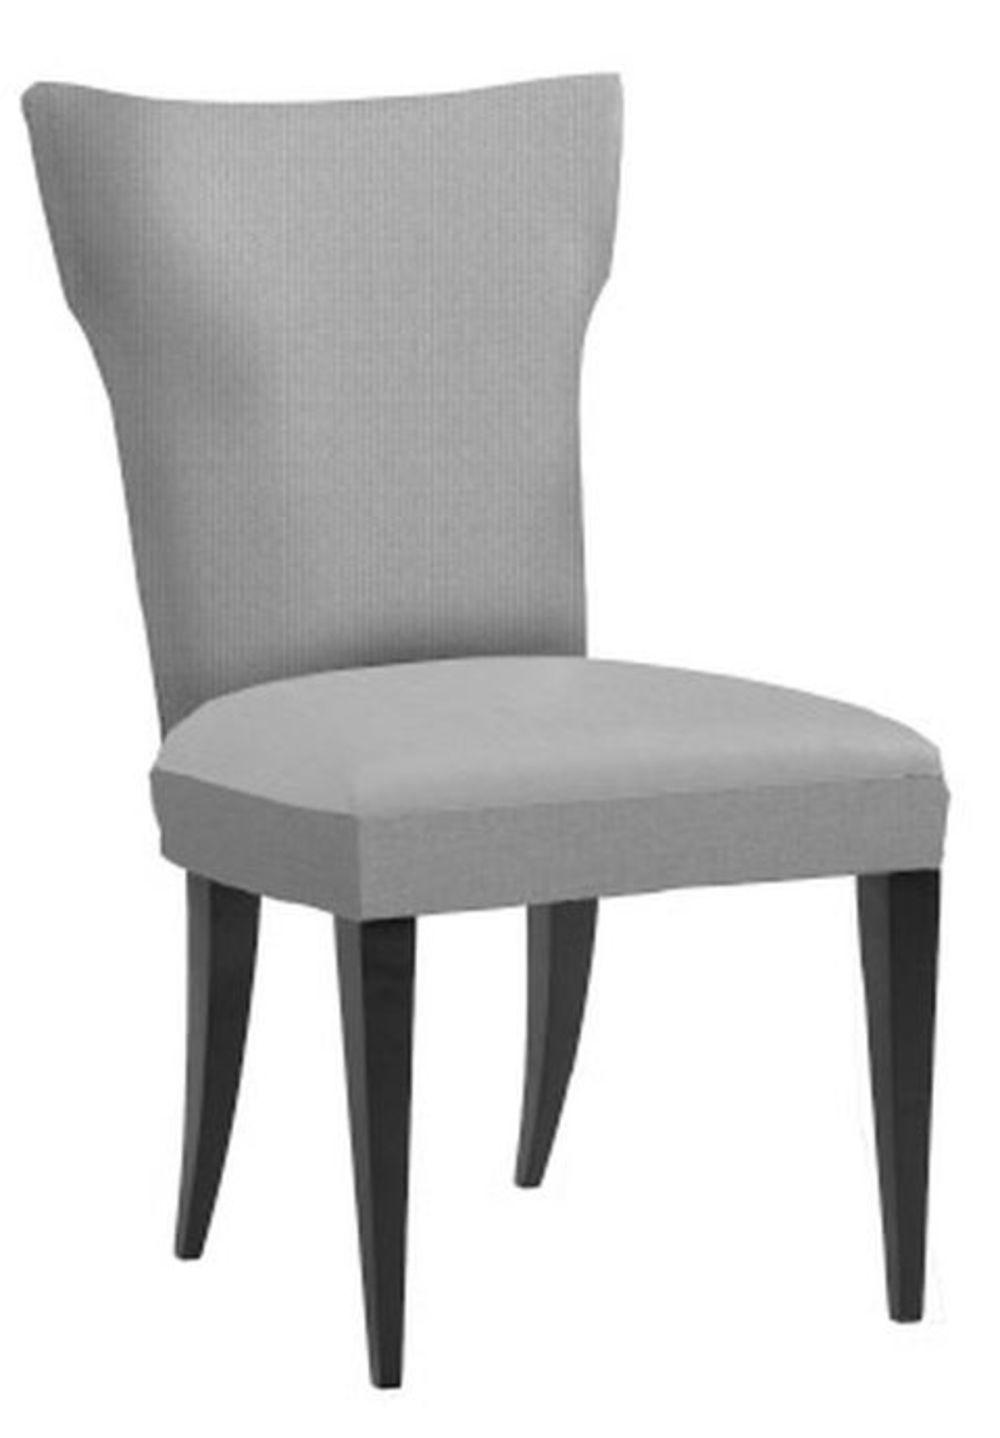 Precedent - A La Carte Dining Chair